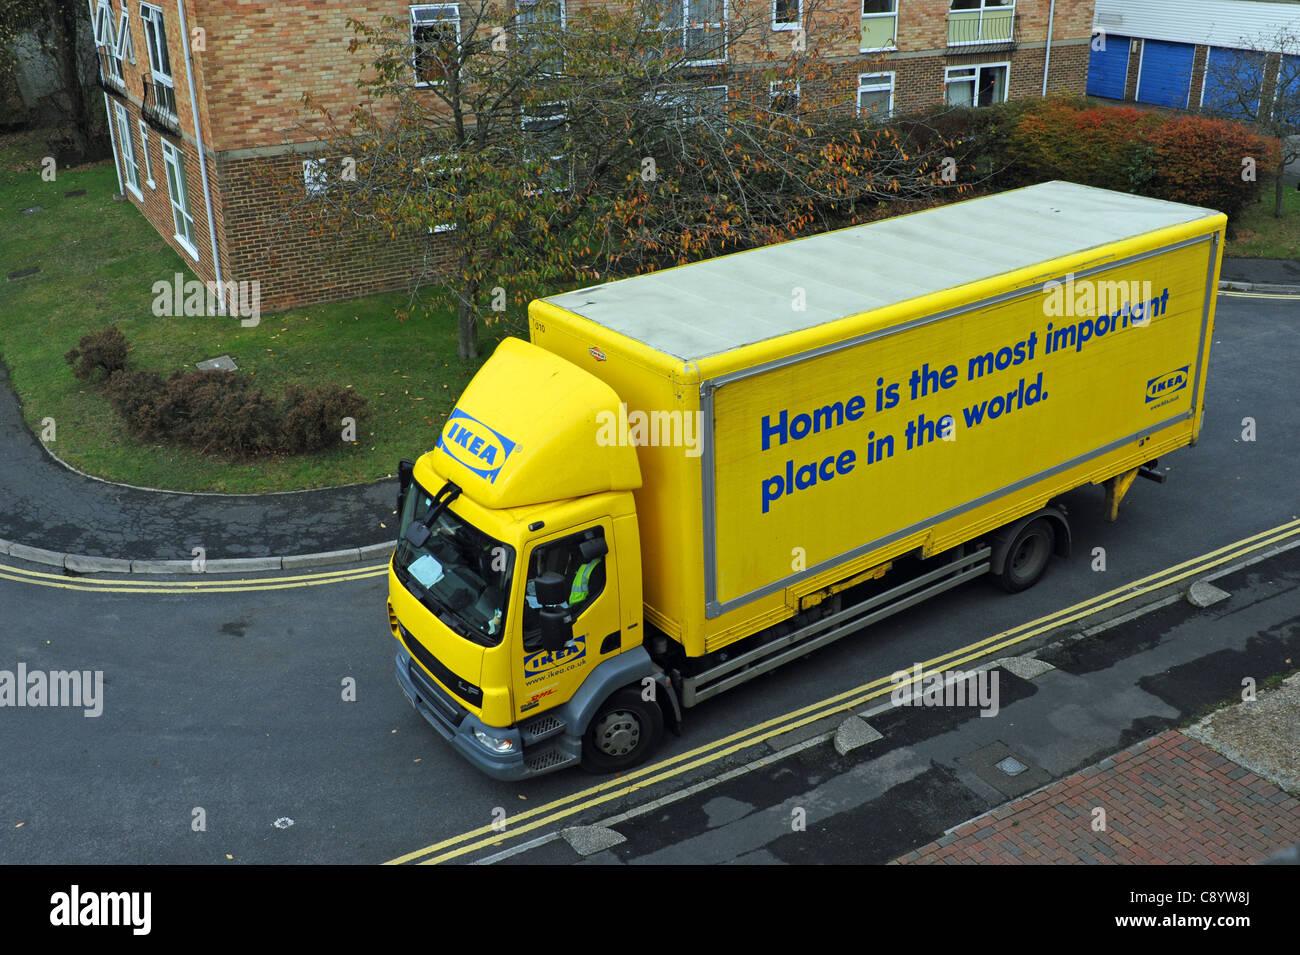 ikea dublin home delivery